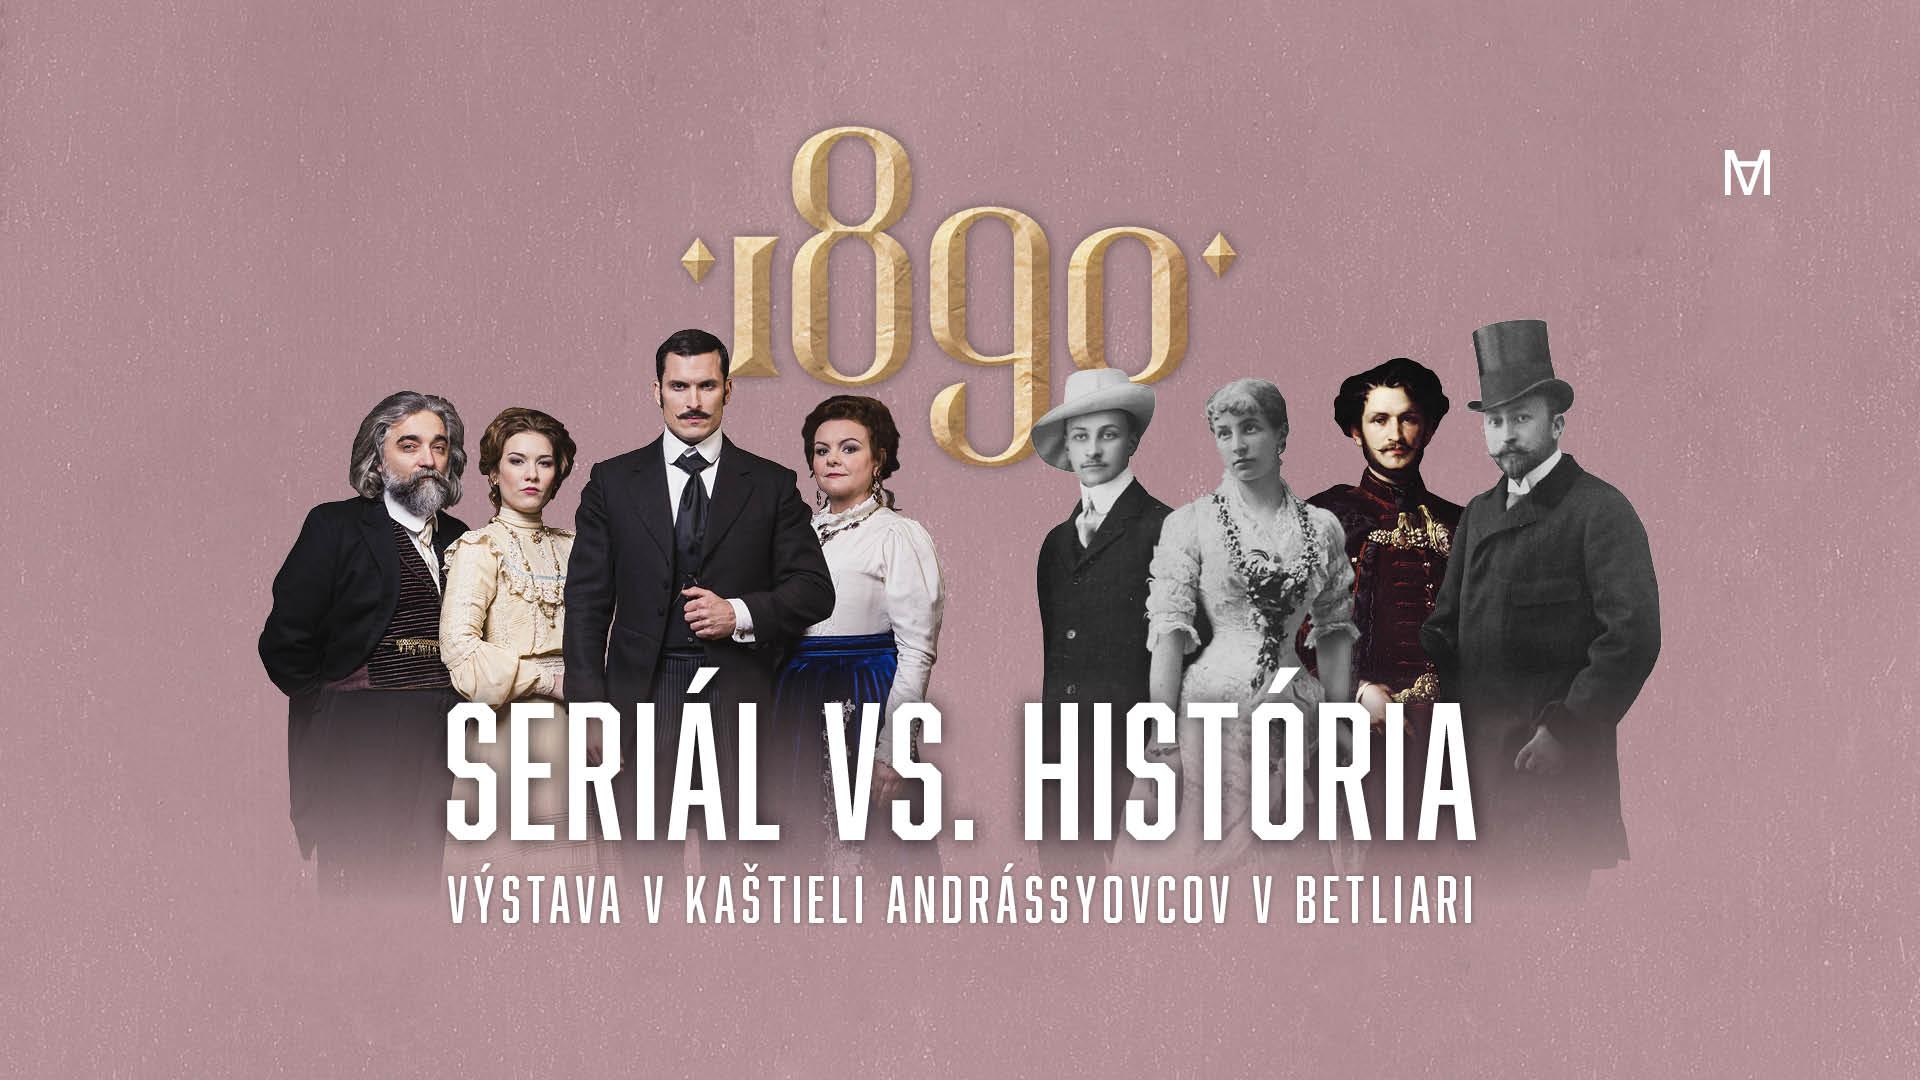 Serial vs historia Betliar